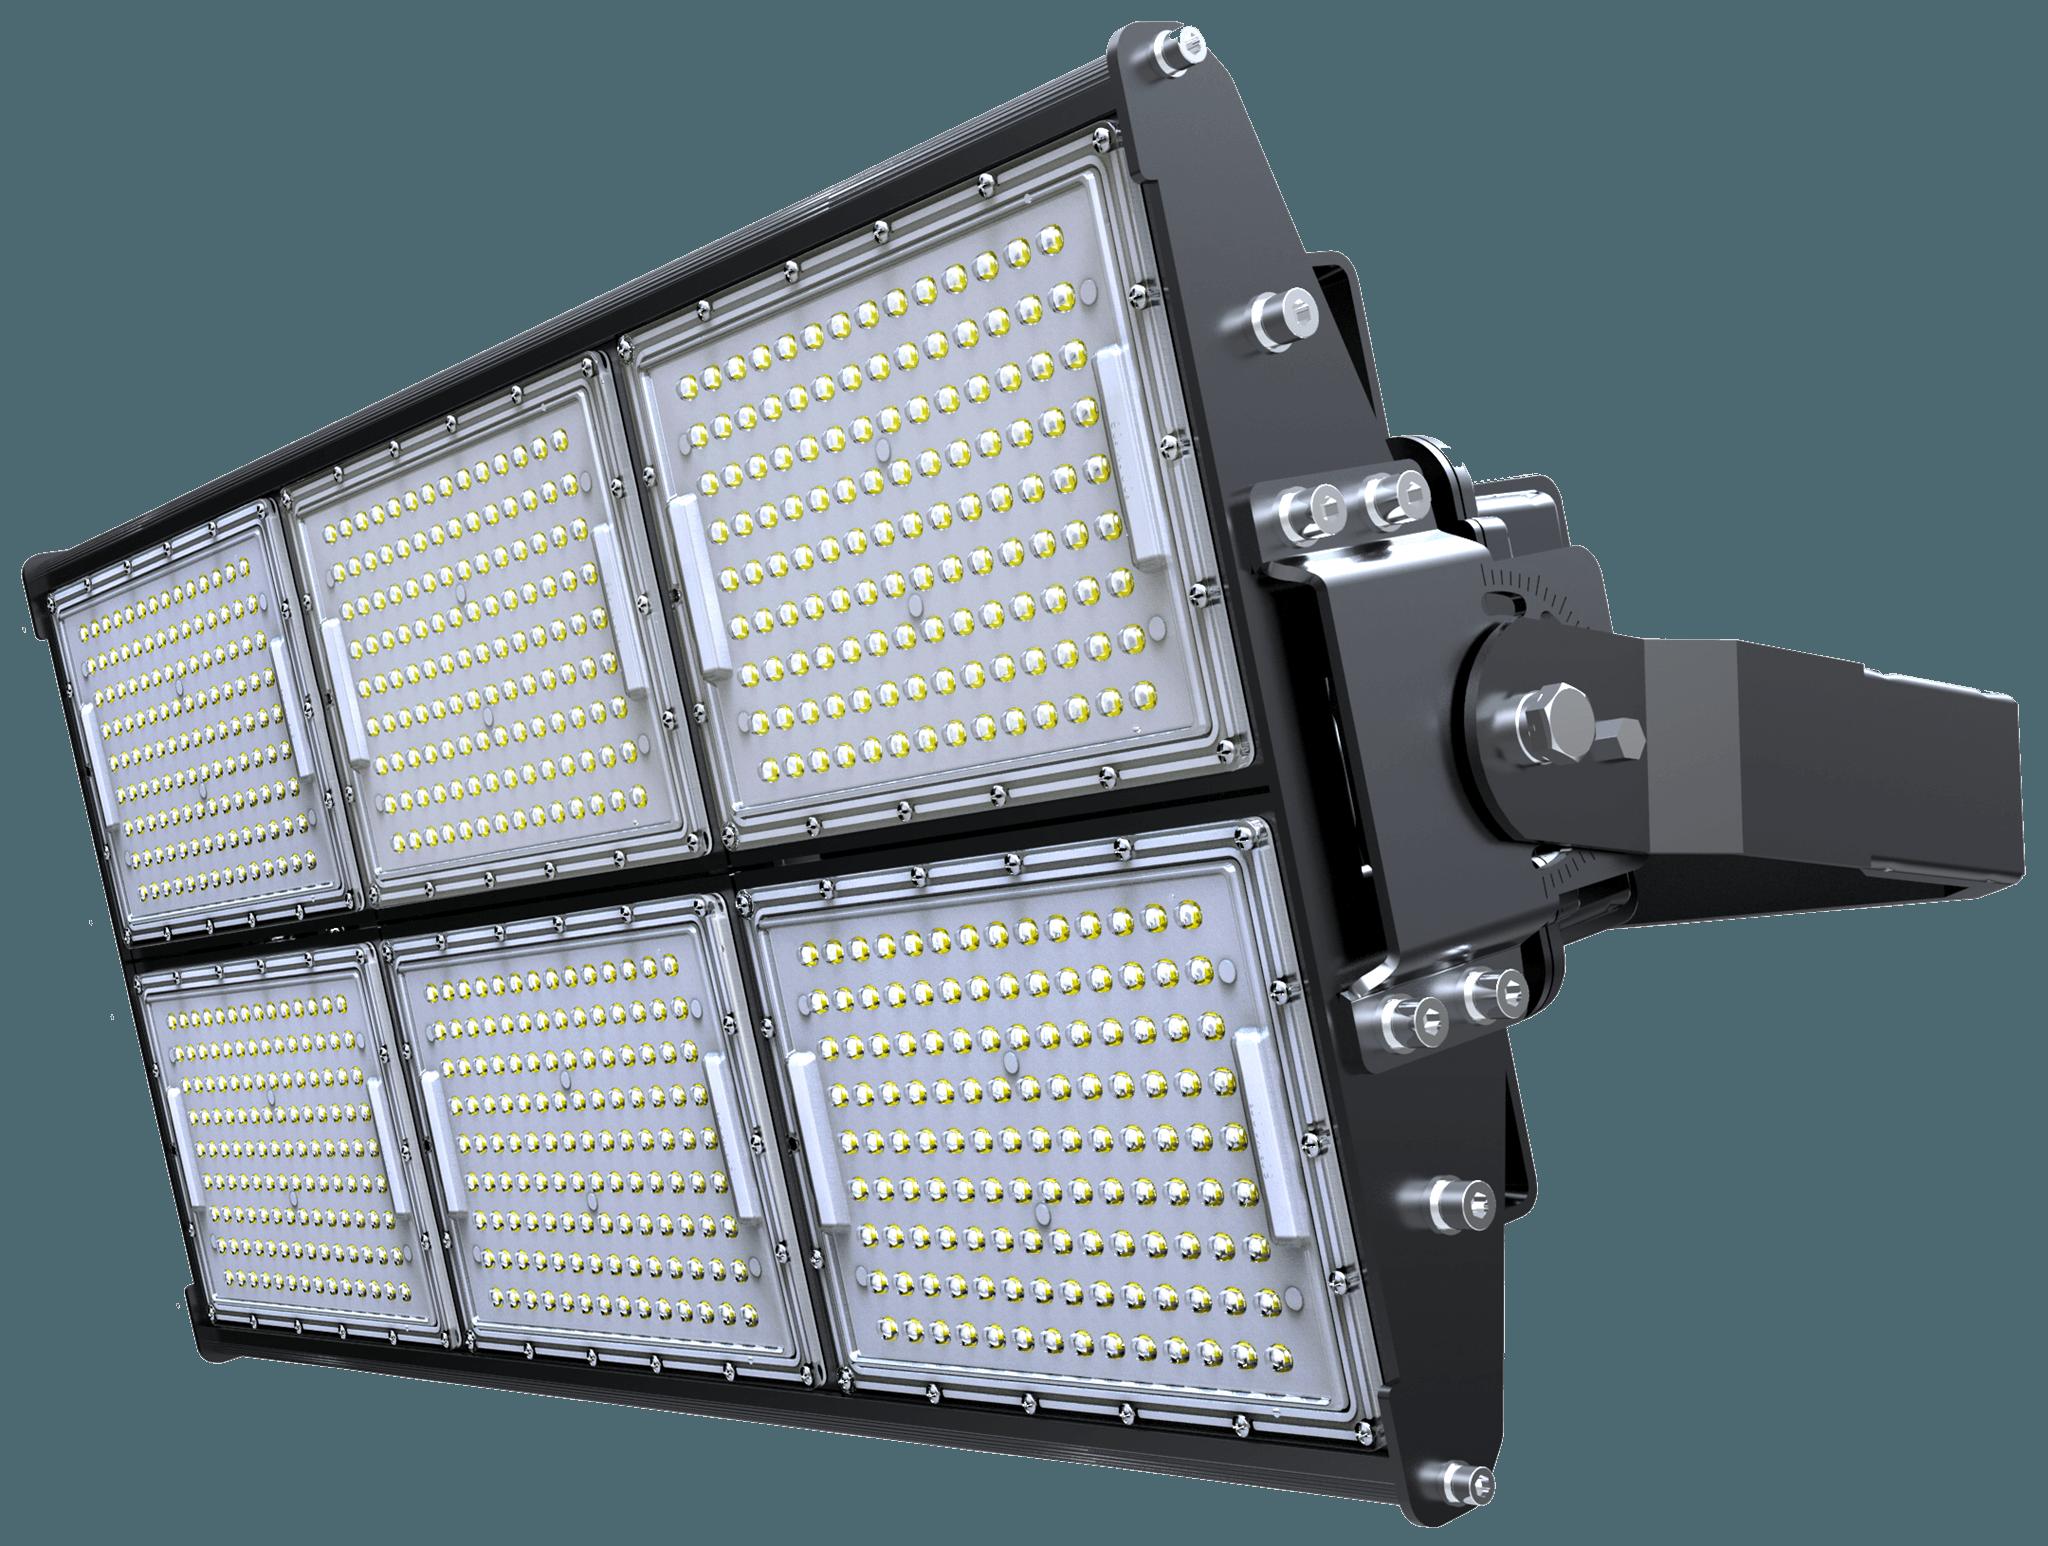 LED Stadium Light 720W, Super Bright Outdoor Flood Light, IP65 Waterproof